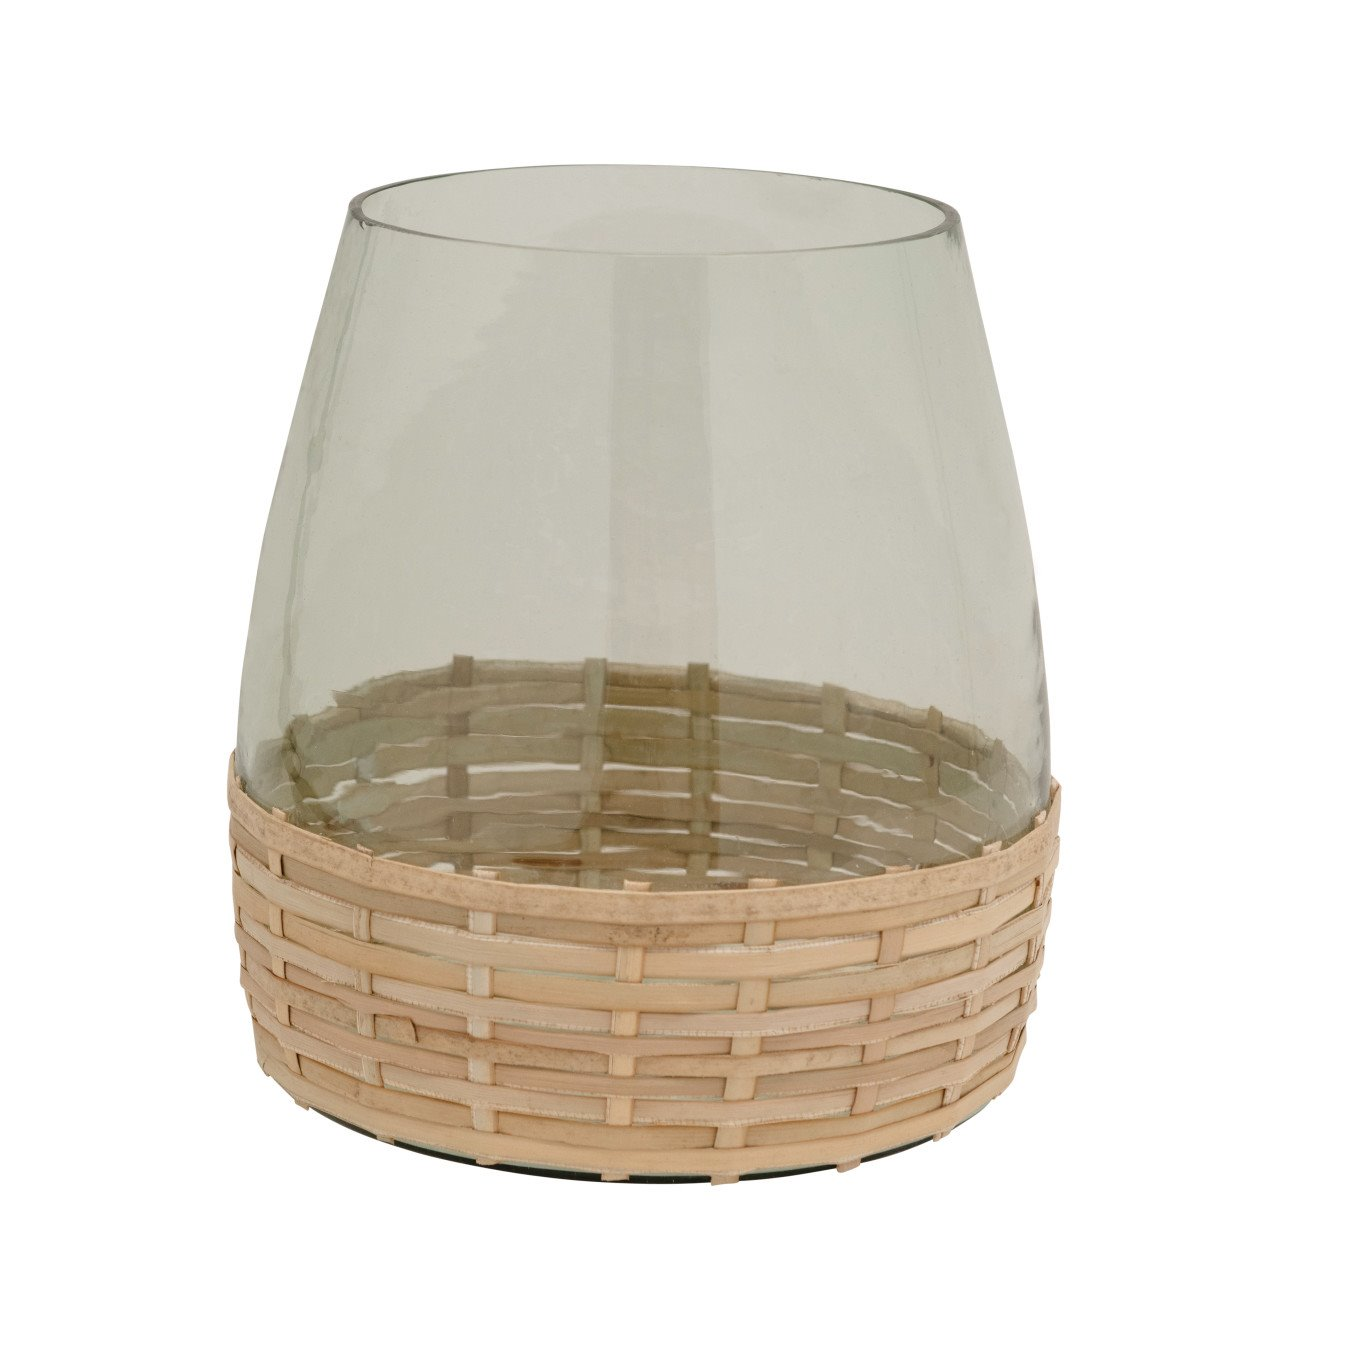 Woven Bamboo & Glass Vase